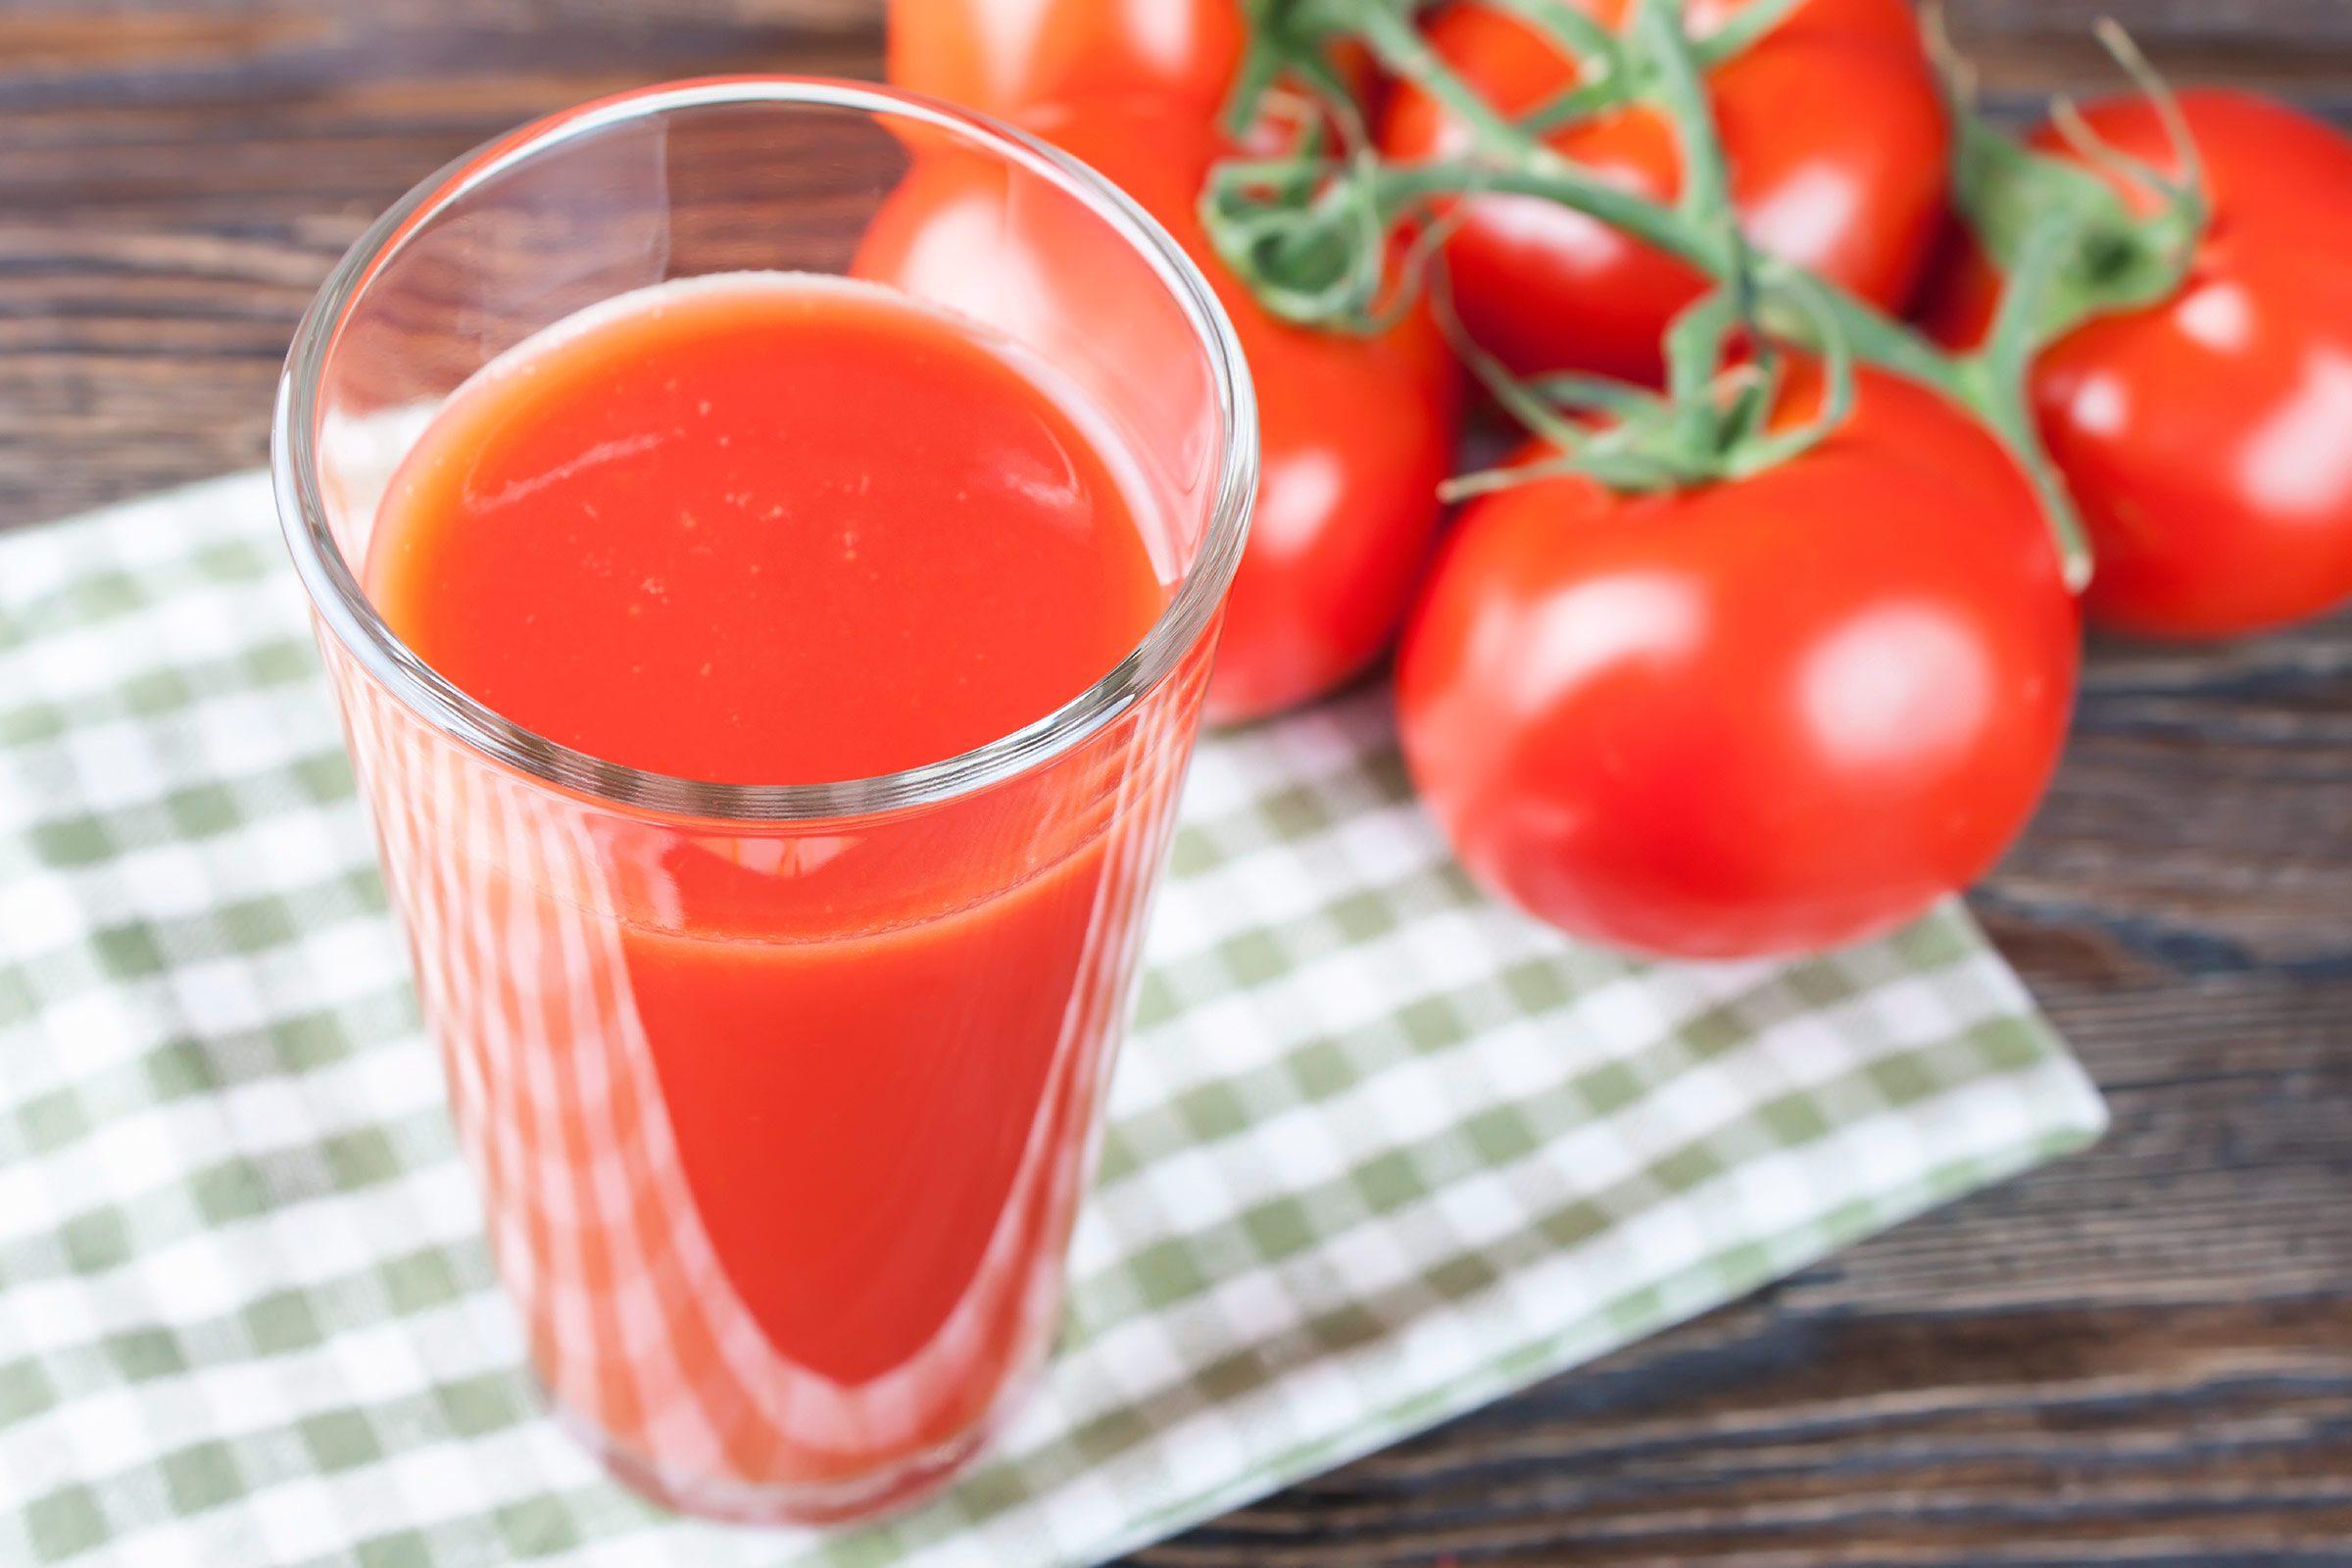 Sore throat remedy: Tomato juice